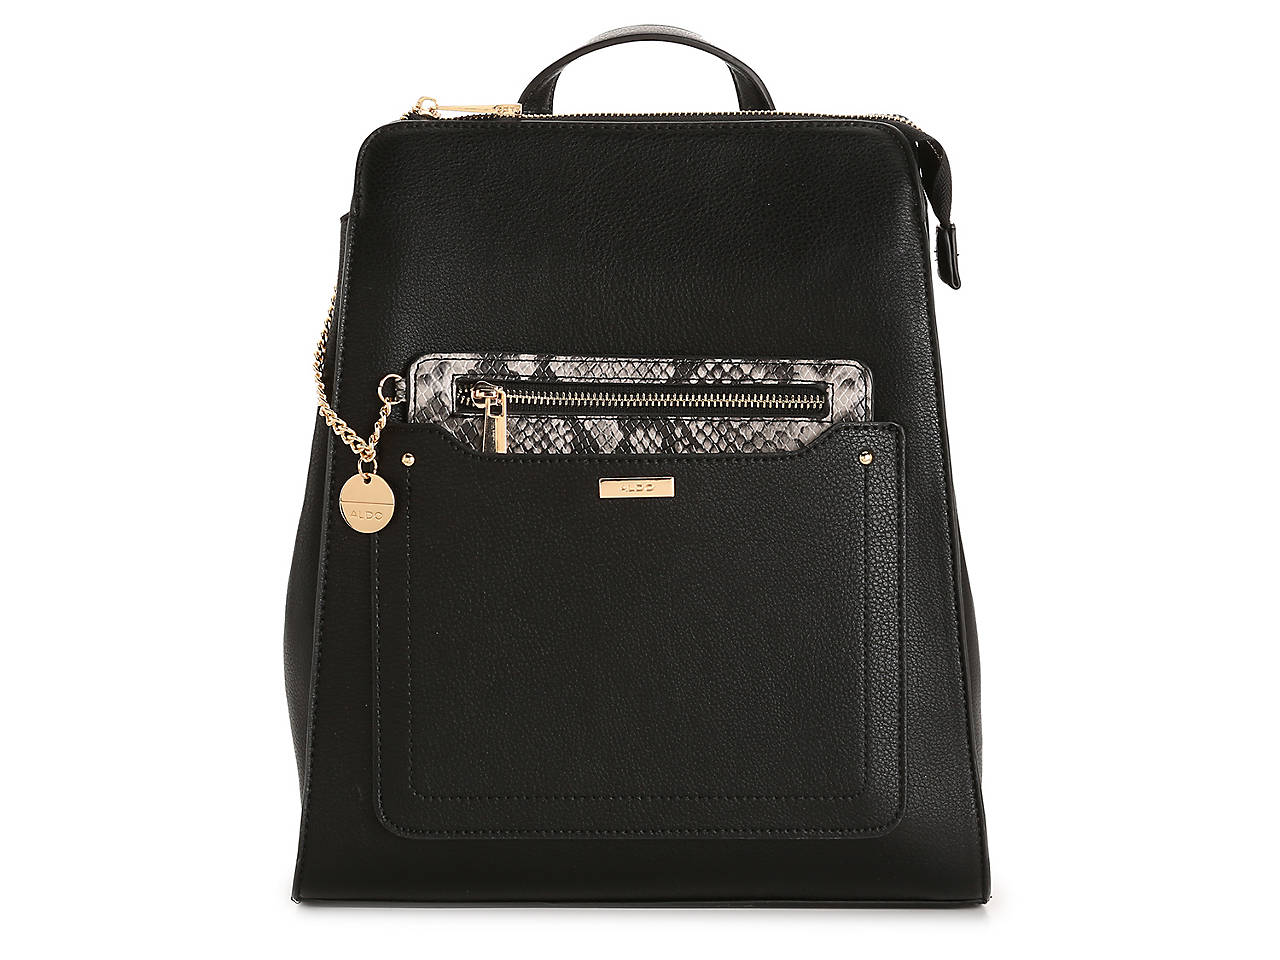 62fa74a5a9d Aldo Portwine Backpack Women s Handbags   Accessories